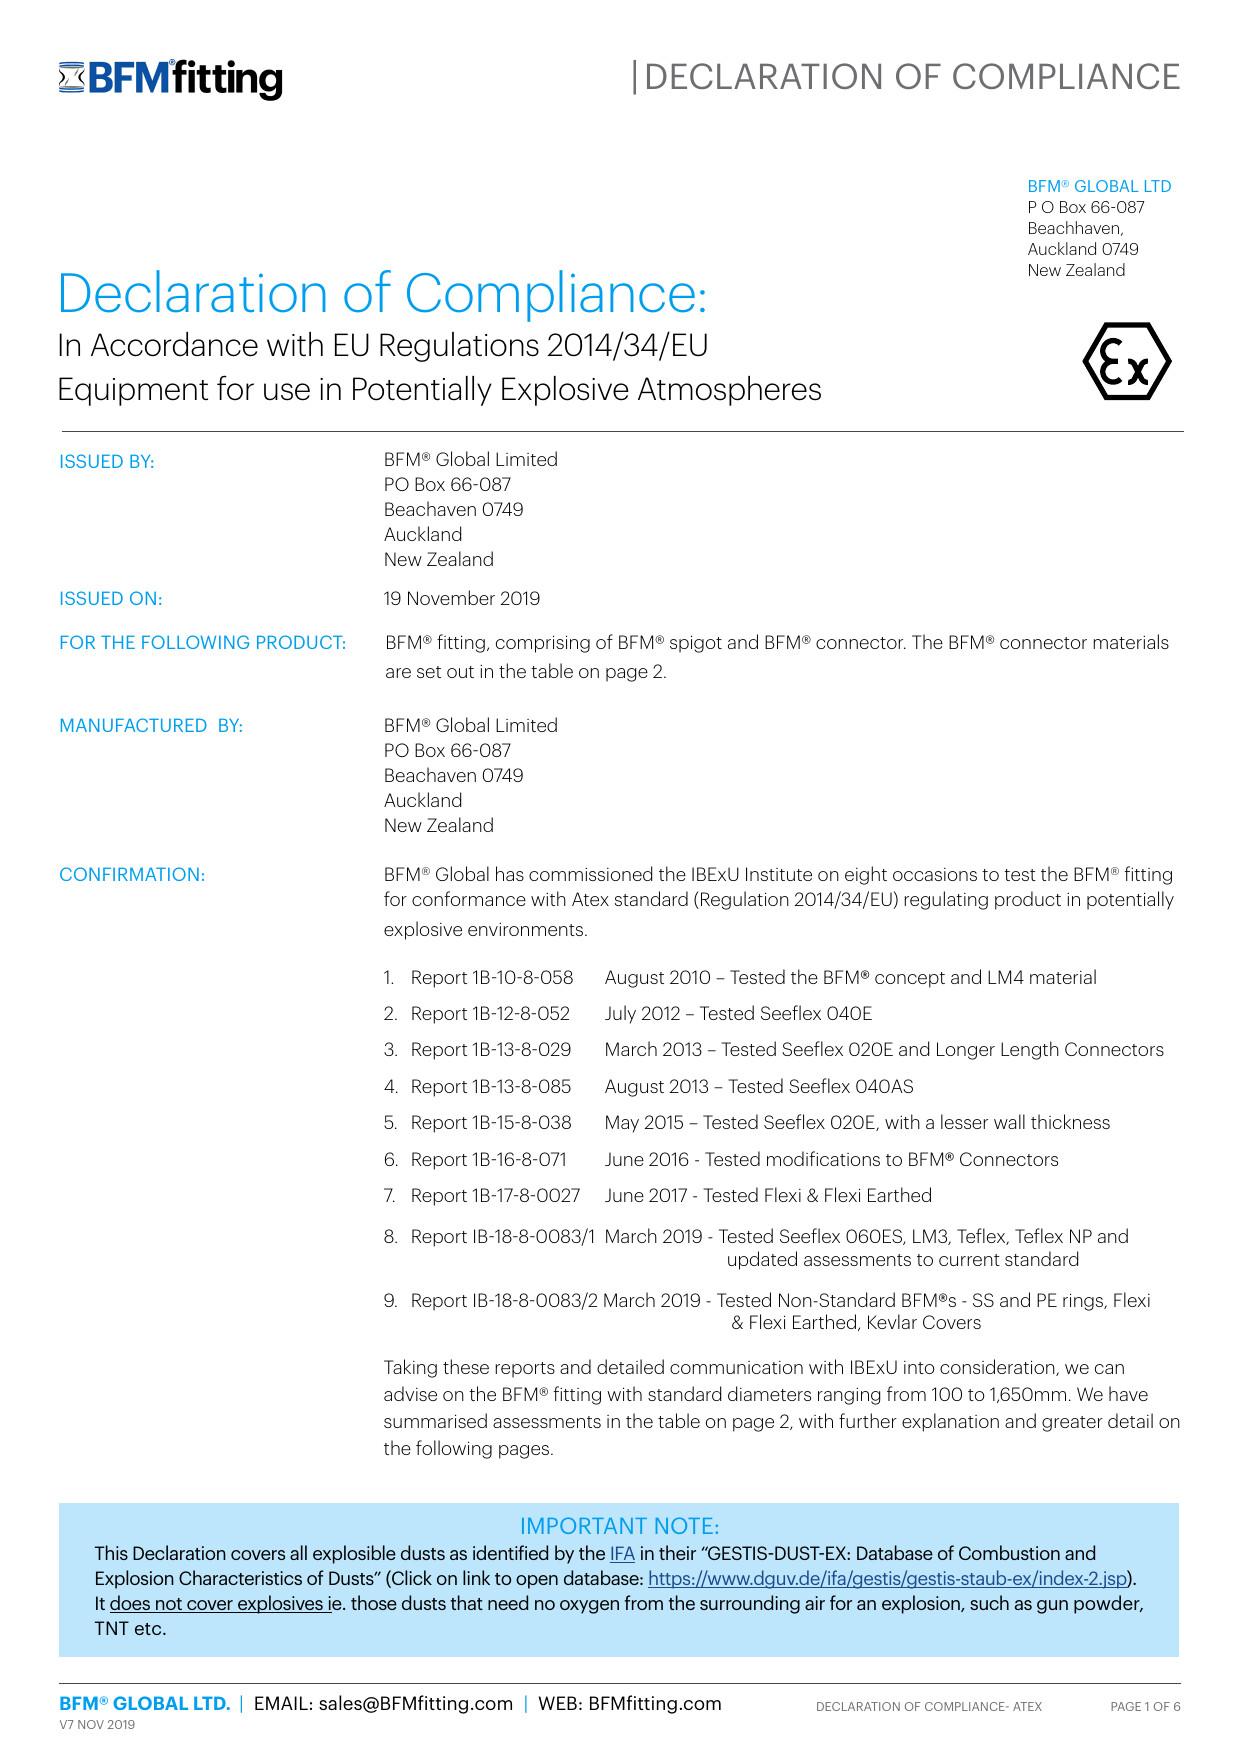 ATEX Declaration of Compliance 1574113527